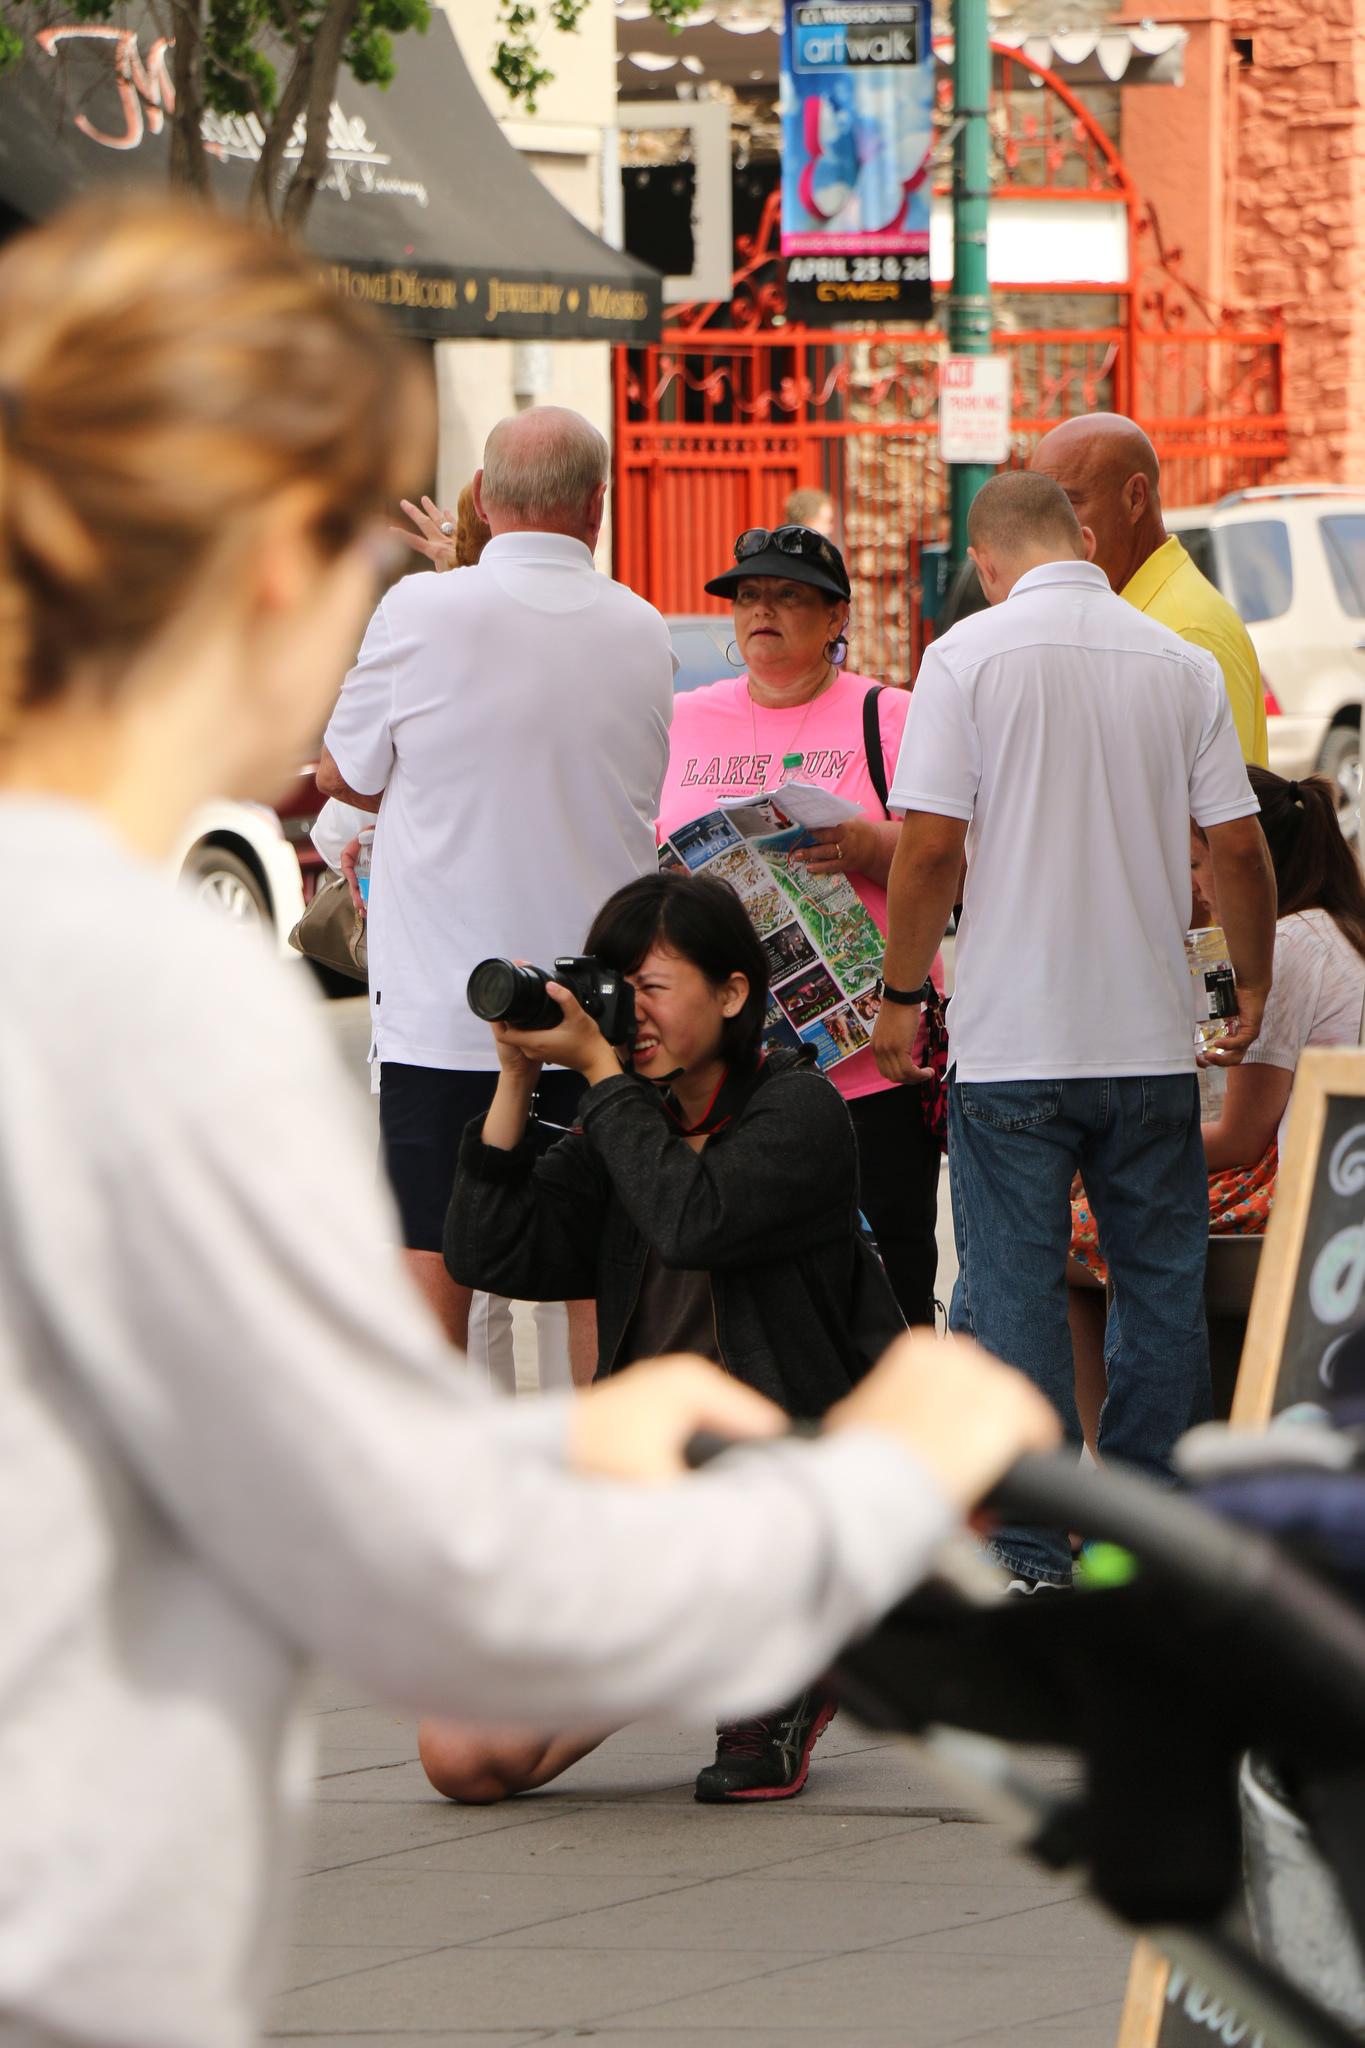 Emily the Photography Class Classmate_18378853678_l.jpg